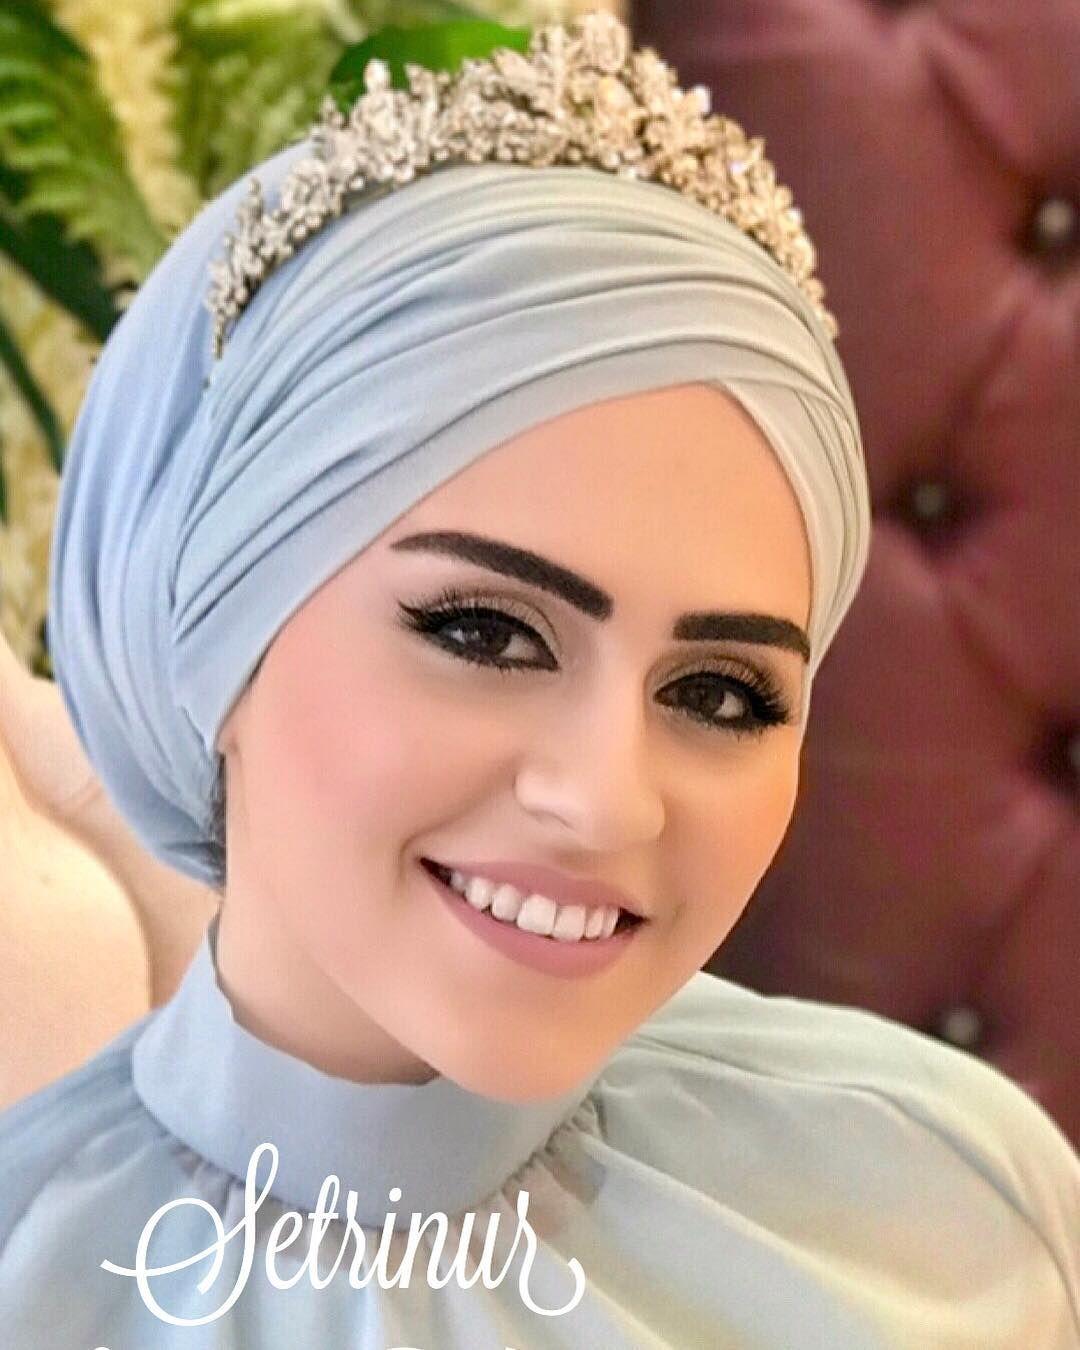 Goruntunun Olasi Icerigi 1 Kisi Wedding Hairstyles With Crown Muslim Wedding Dresses Hijab Dress Party